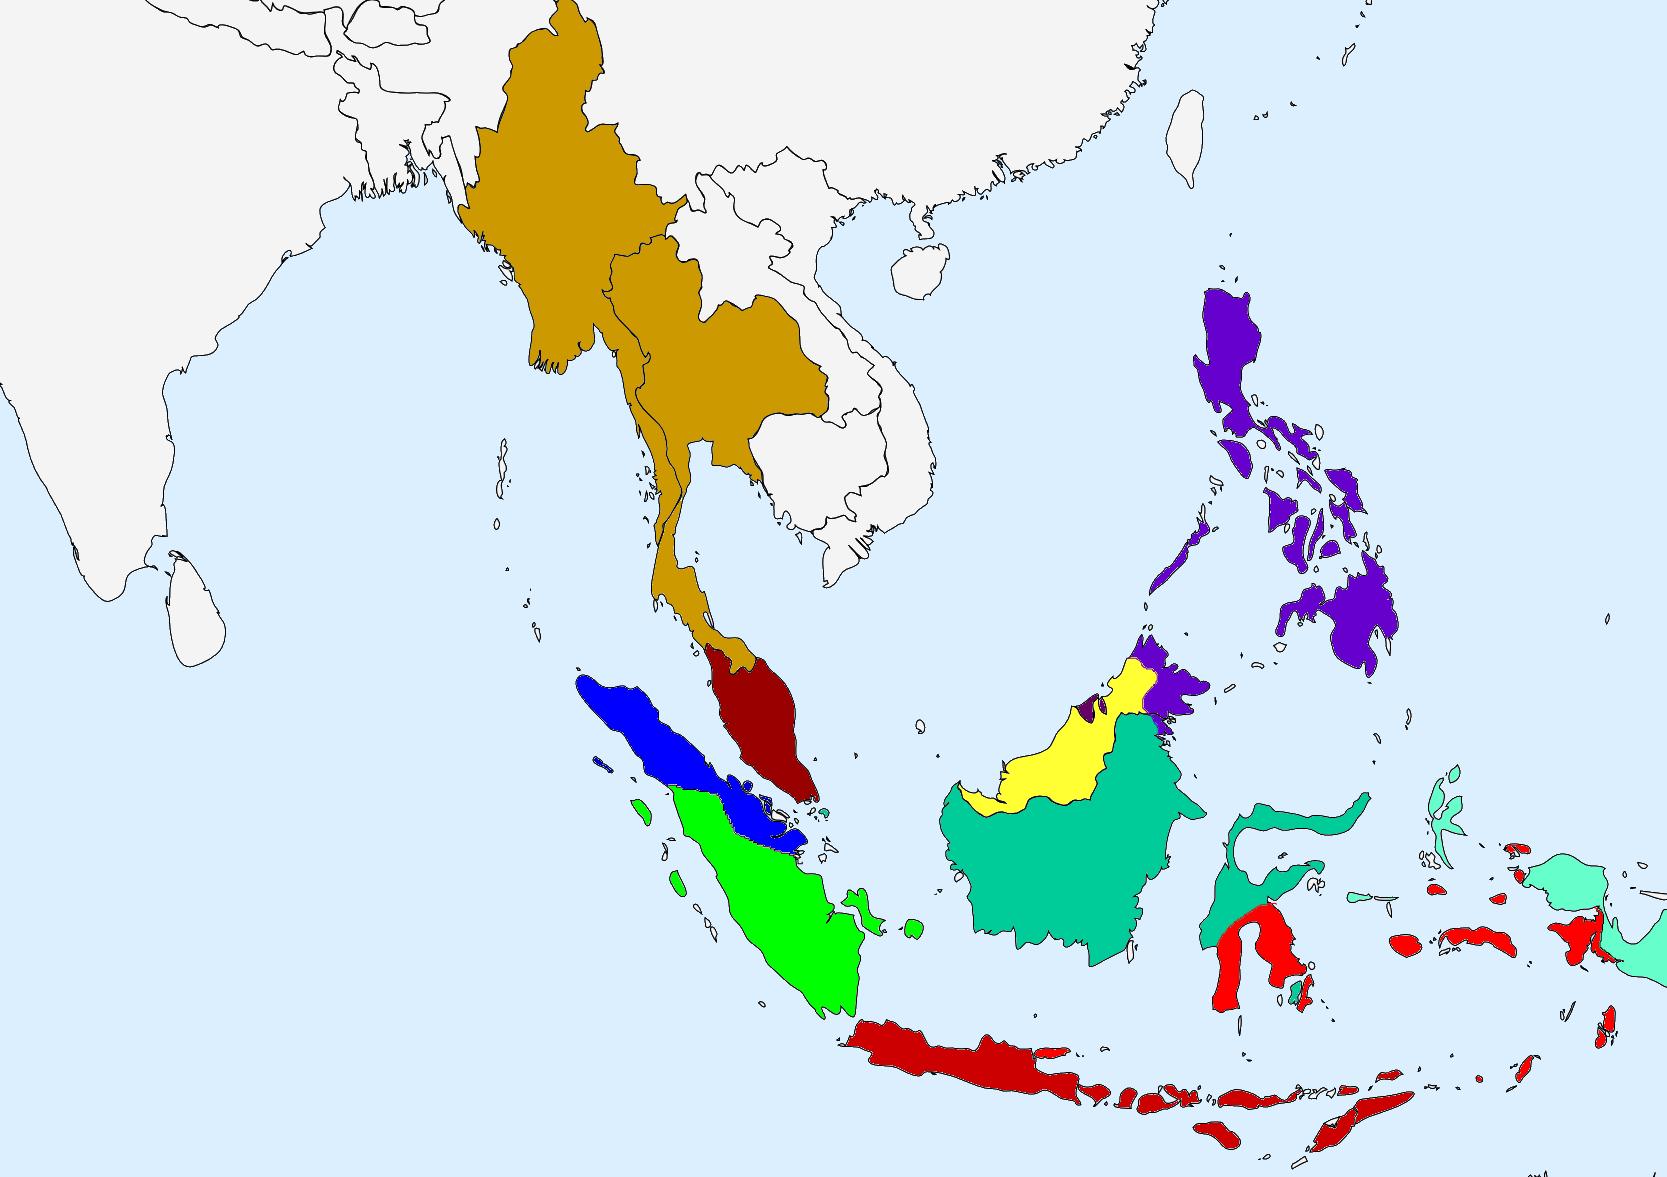 Land of empires map game alternative history fandom powered by indonesian civil war map seasia1000base altavistaventures Gallery